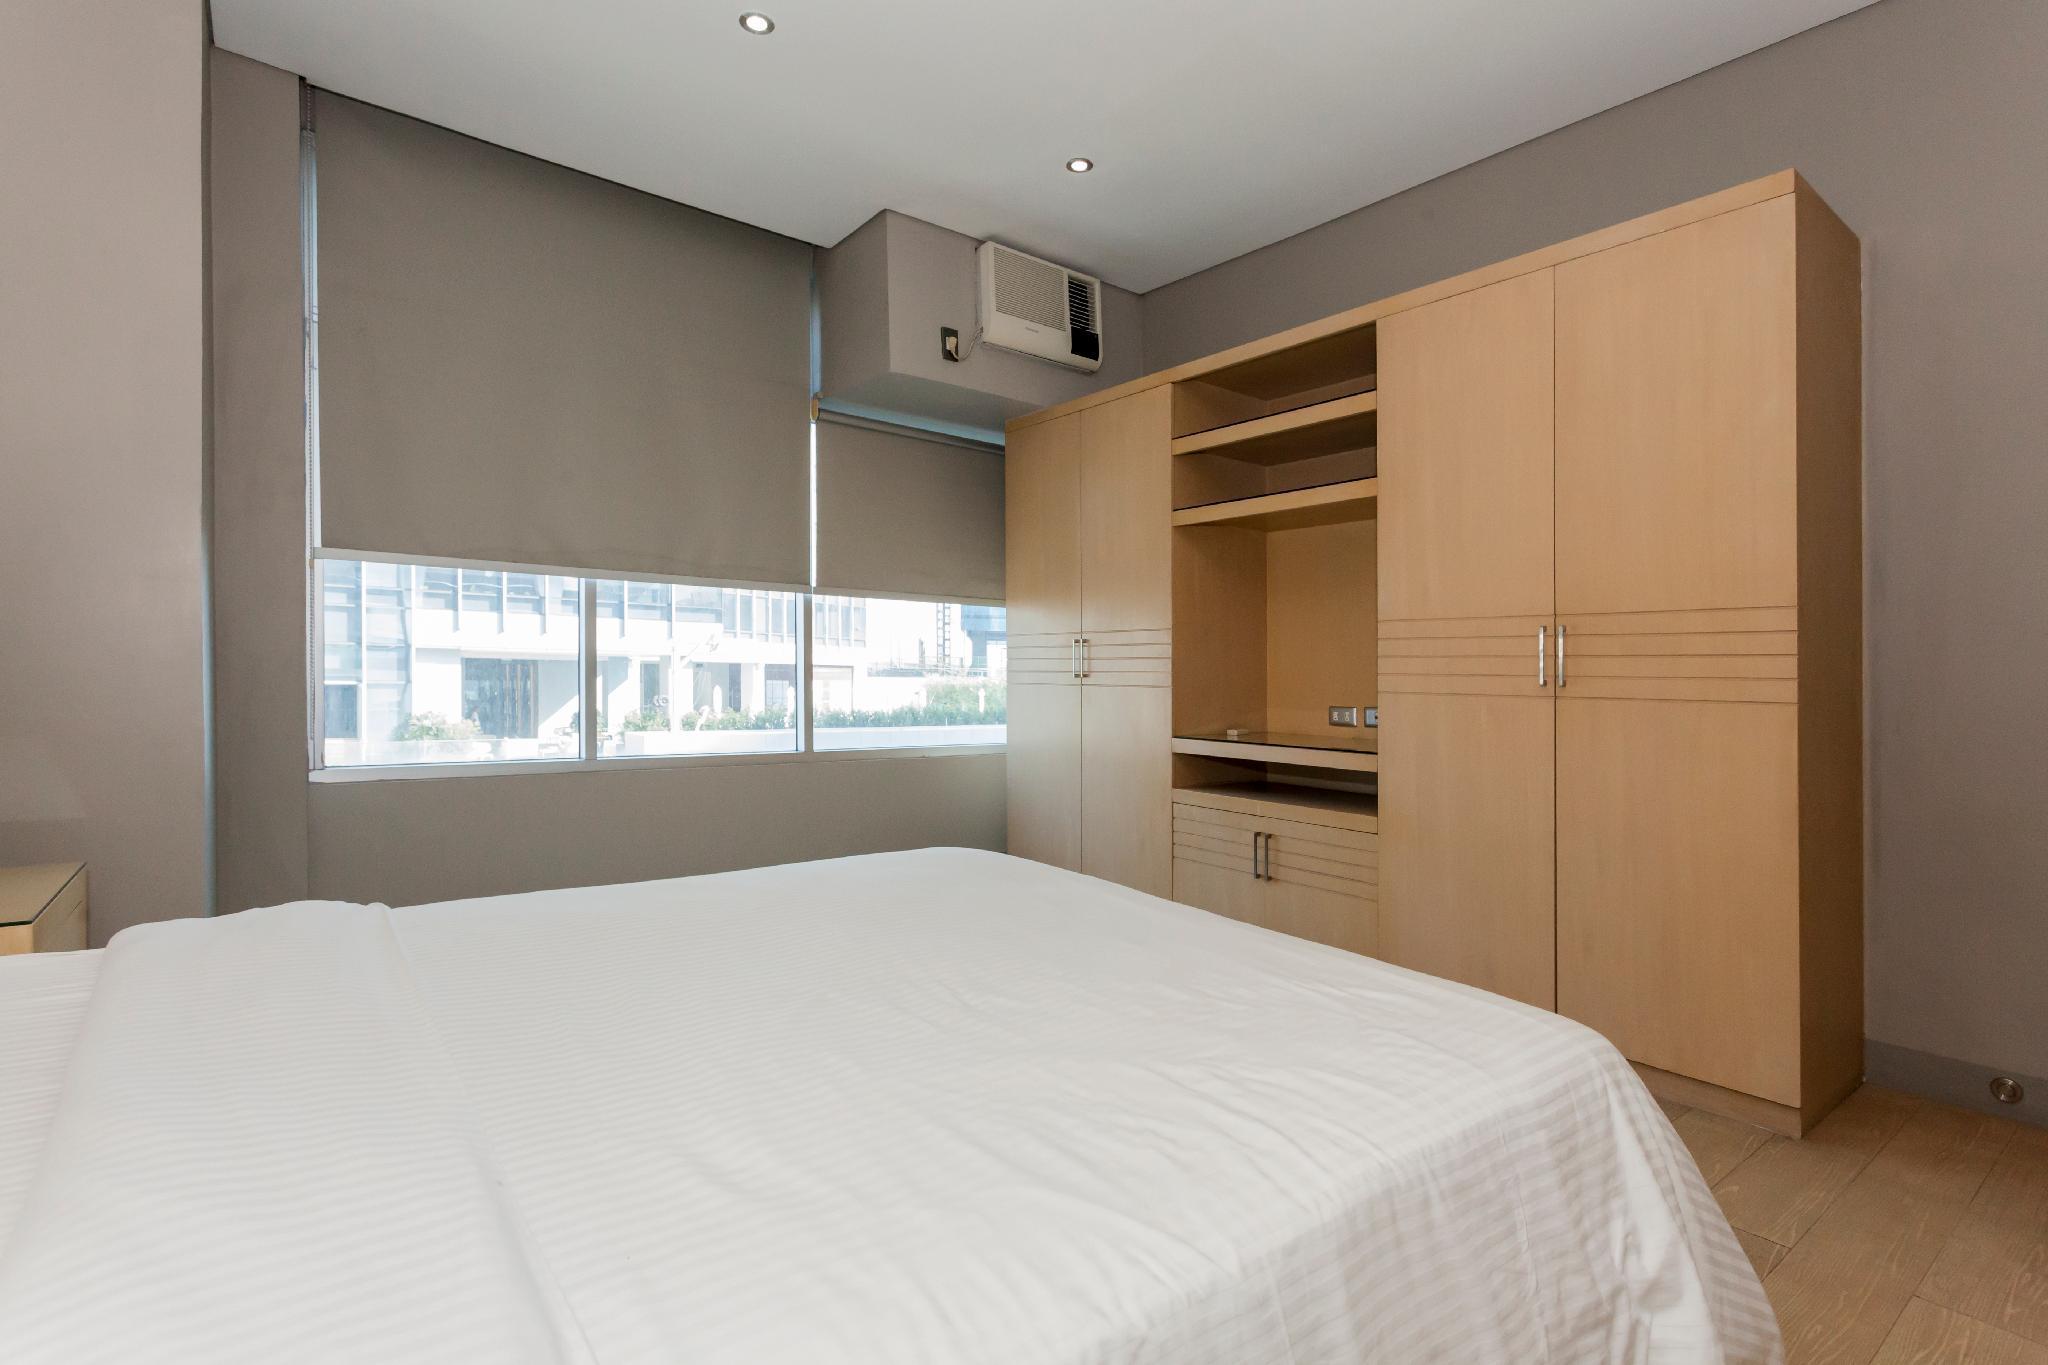 The Luxe Wonderful 3 Bedroom